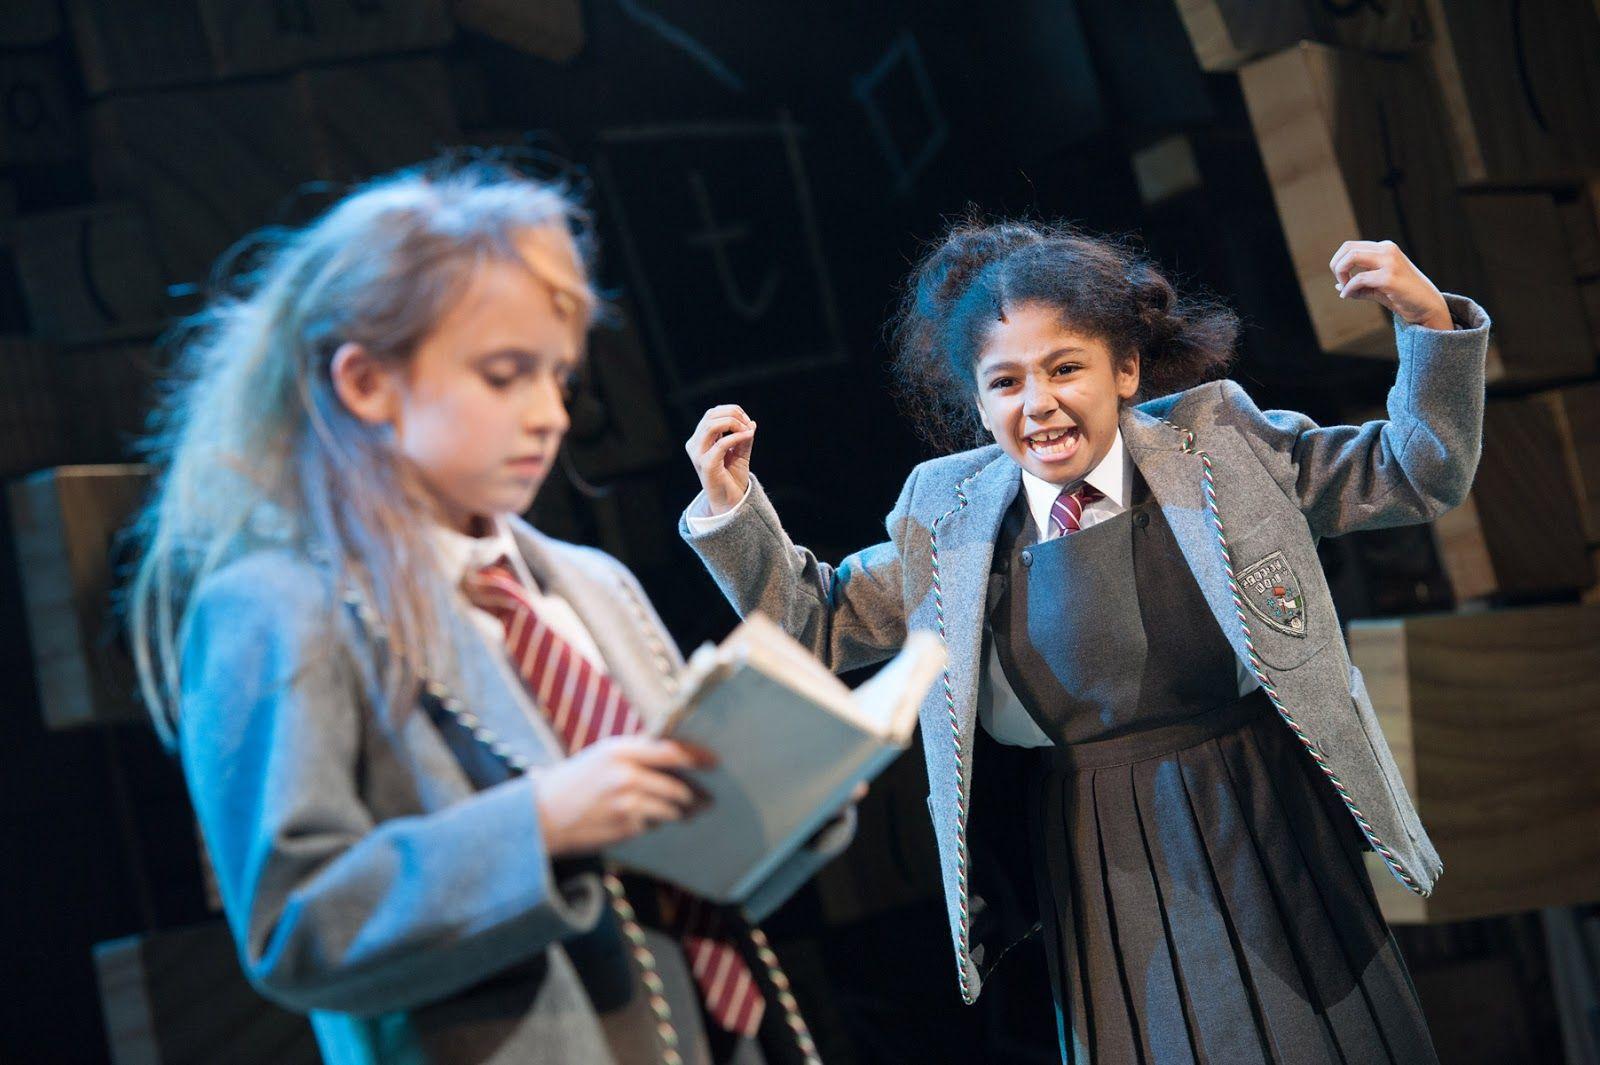 Matilda, o musical, Broadway, New York. #Matilda #musical #Broadway #Ingressos Reserve o seu ingresso: http://www.weplann.com.br/nova-york/ingressos-matilda